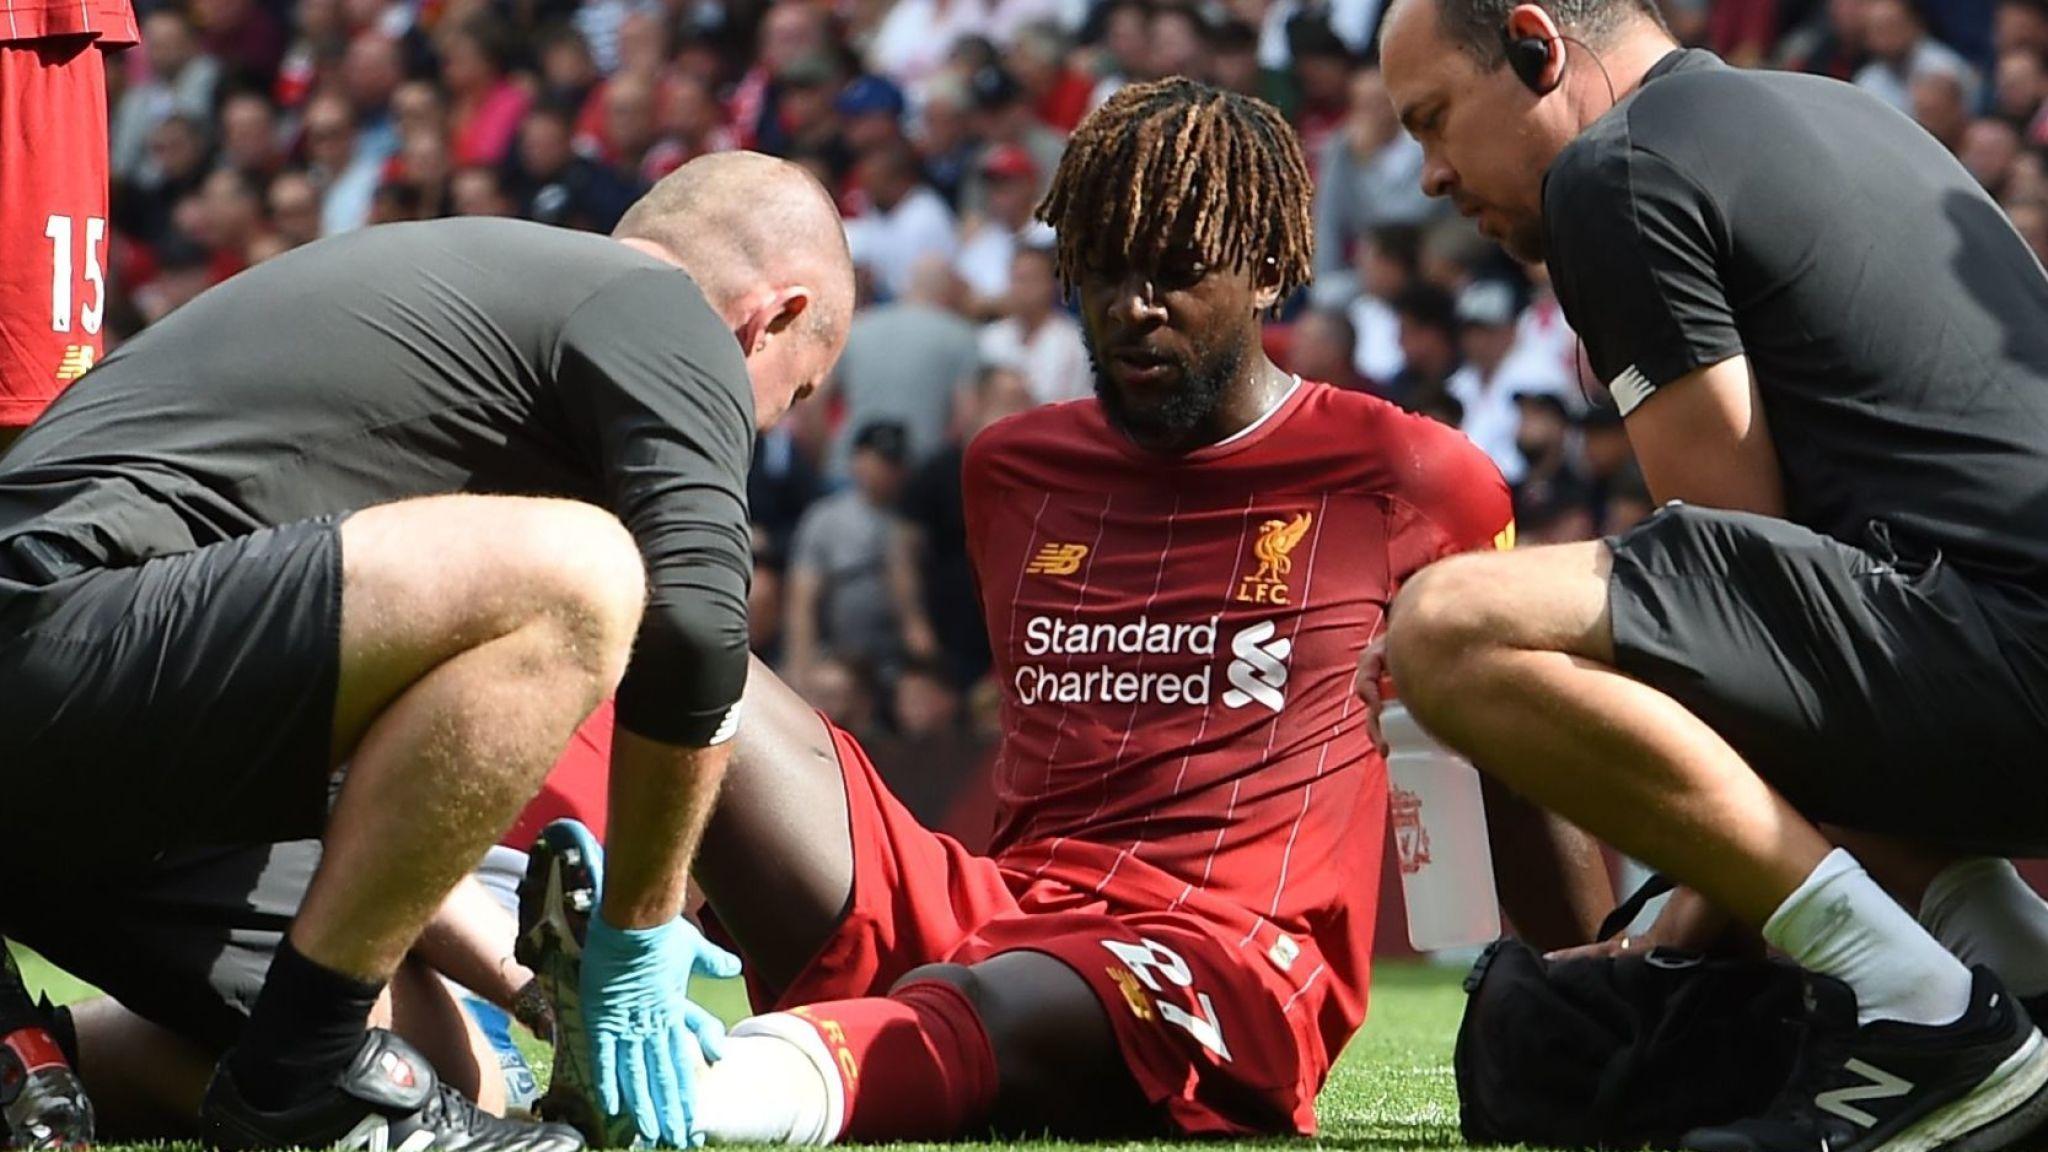 Training Ground Guru | Clubs urged to re-consider touchline surfaces after Origi injury